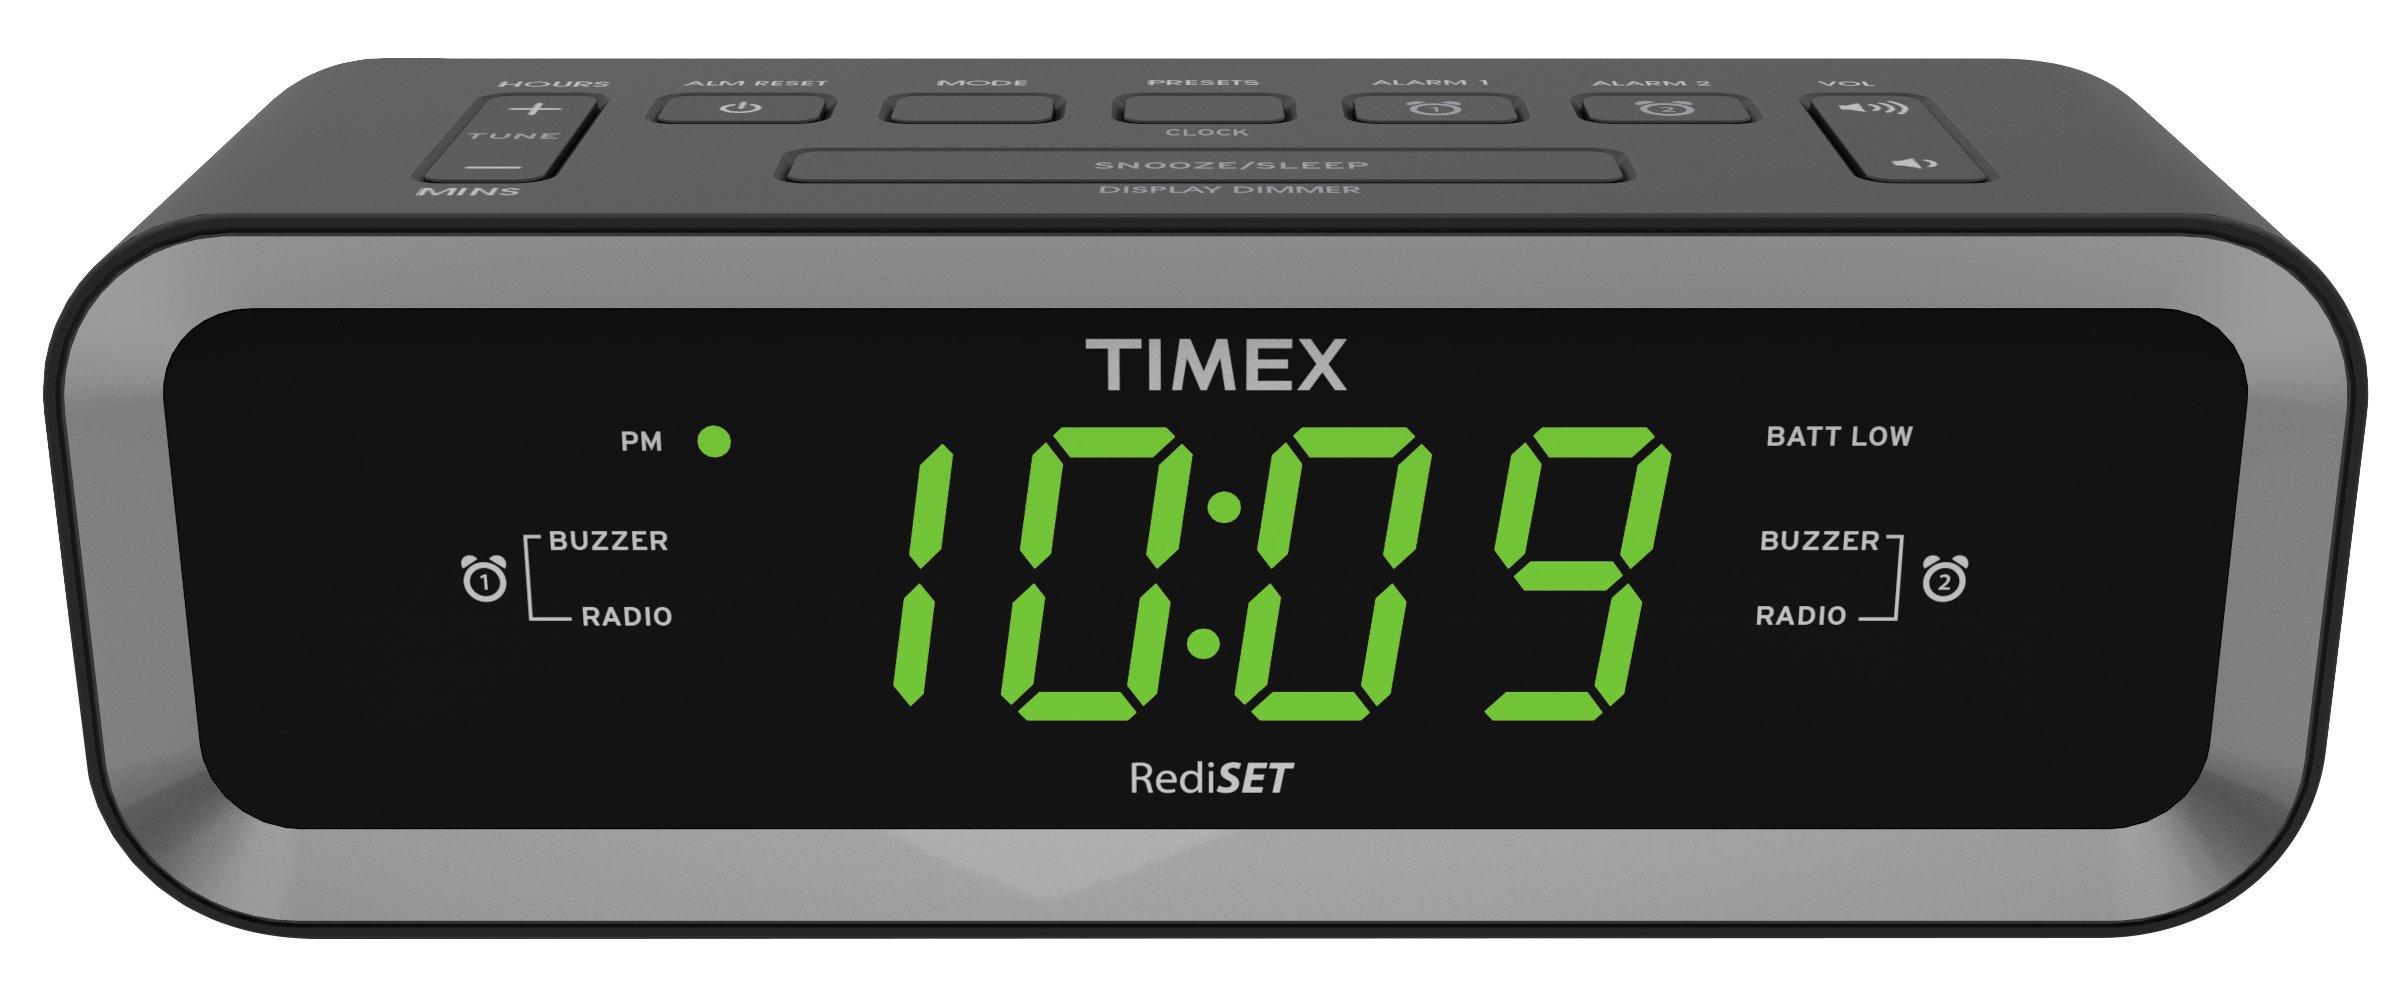 cheap timex dual alarm clock find timex dual alarm clock deals on rh guide alibaba com Timex Nature Sounds Clock Manual Timex Nature Sounds Clock Manual